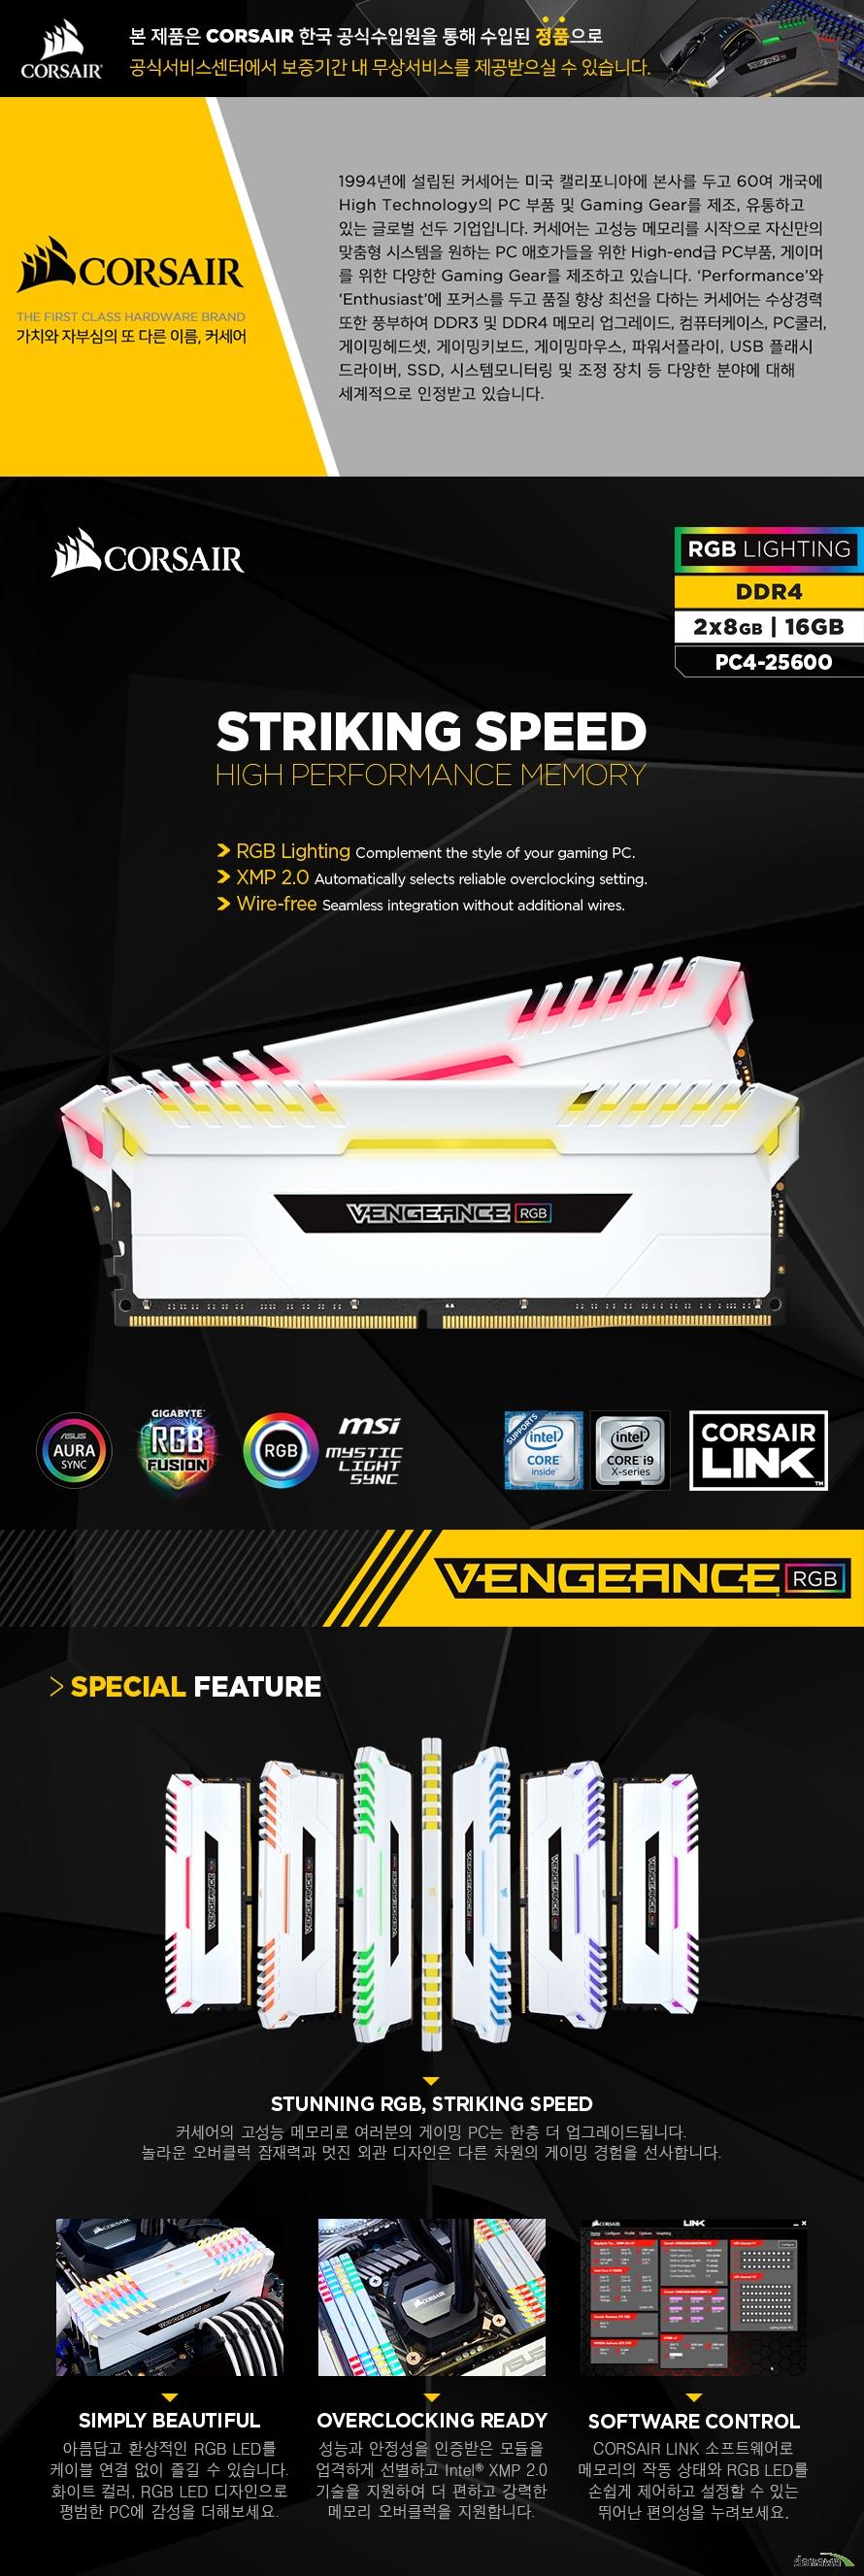 CORSAIR DDR4 16GB PC4-25600 CL16 VENGEANCE WHITE RGB (8Gx2) 커세어의 고성능 메모리로 여러분의 게이밍 PC는 한층 더 업그레이드됩니다. 놀라운 오버클럭 잠재력과 멋진 외관 디자인은 다른 차원의 게이밍 경험을 선사합니다.